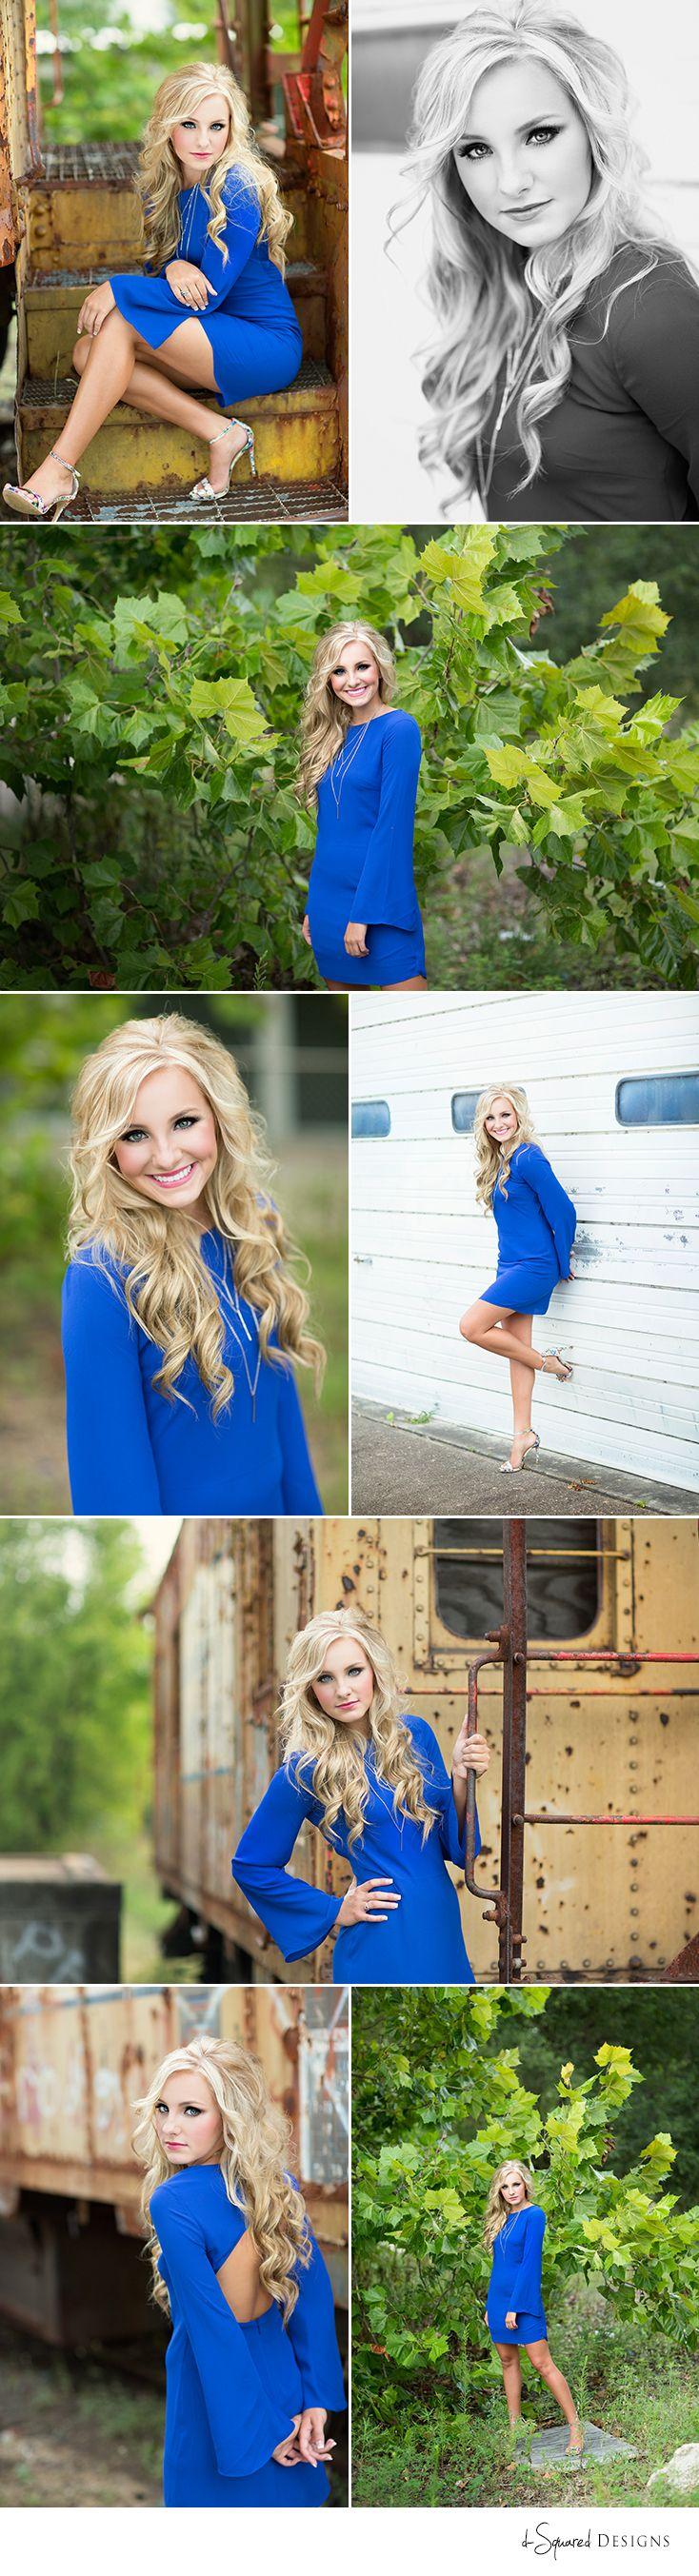 d-Squared Designs St. Louis, MO Senior Photography. Fashion senior. Gorgeous blonde. Senior photography.